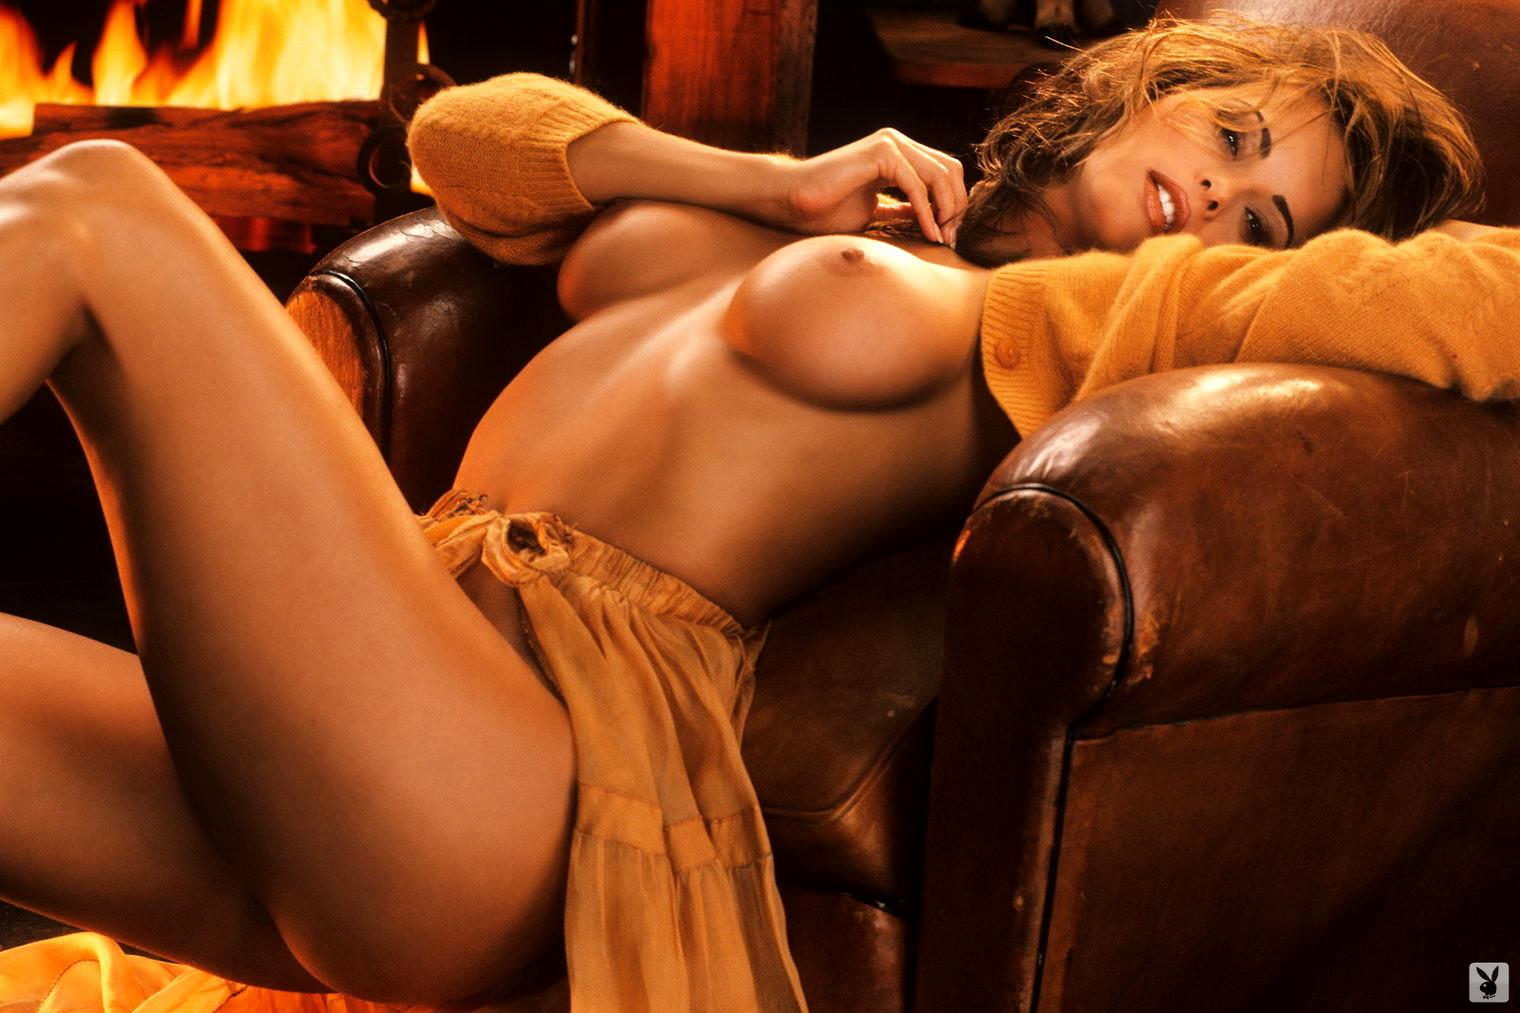 karen-mcdougal-nudes-pics